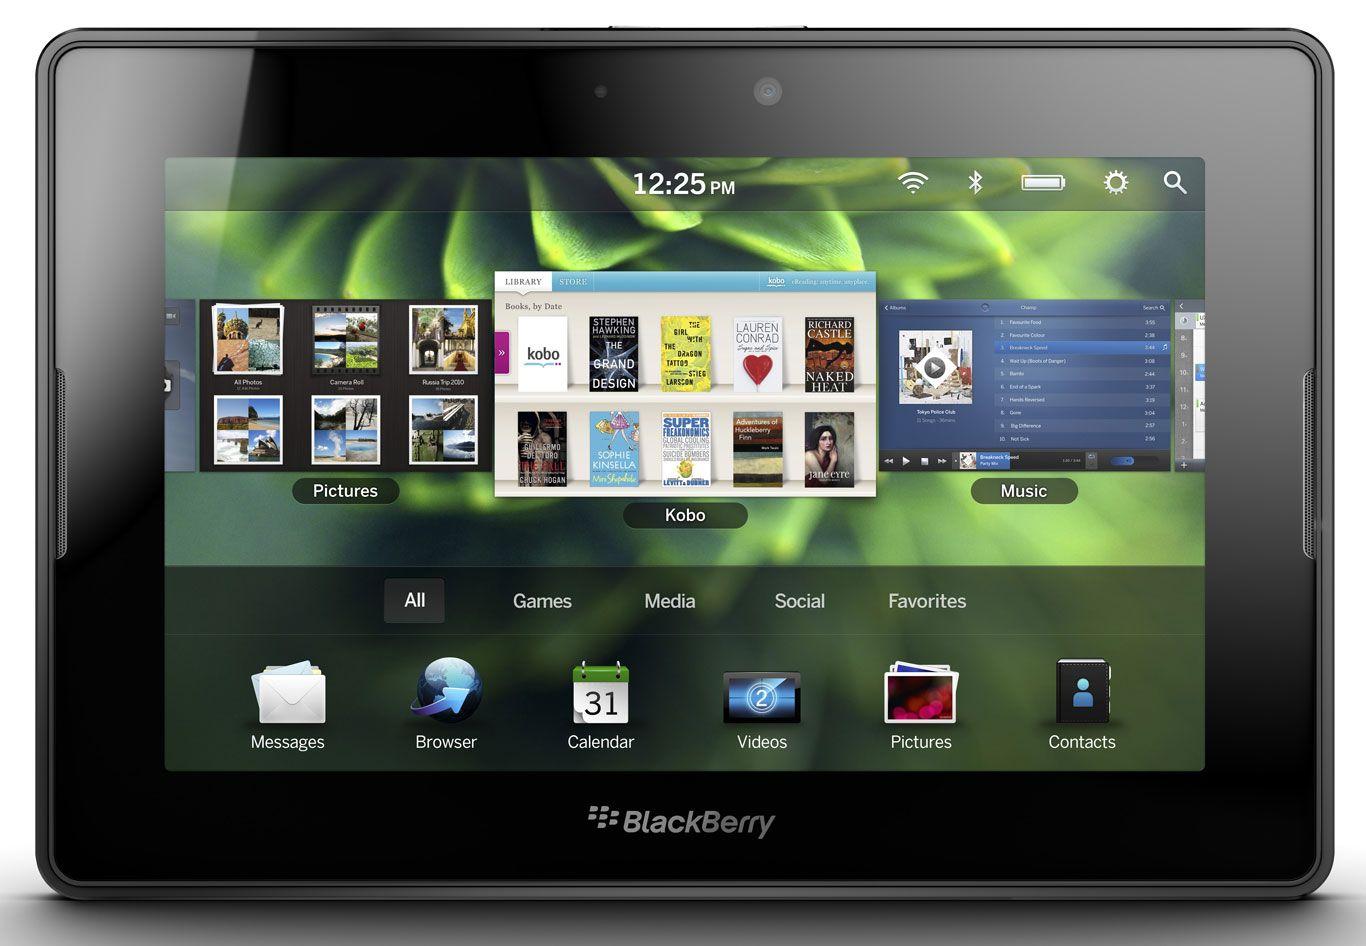 Apple iPad 2, Samsung Galaxy Tab 10.1, Motorola Xoom, BlackBerry PlayBook, Amazon Kindle Fire , Barnes & Noble Nook Tablet